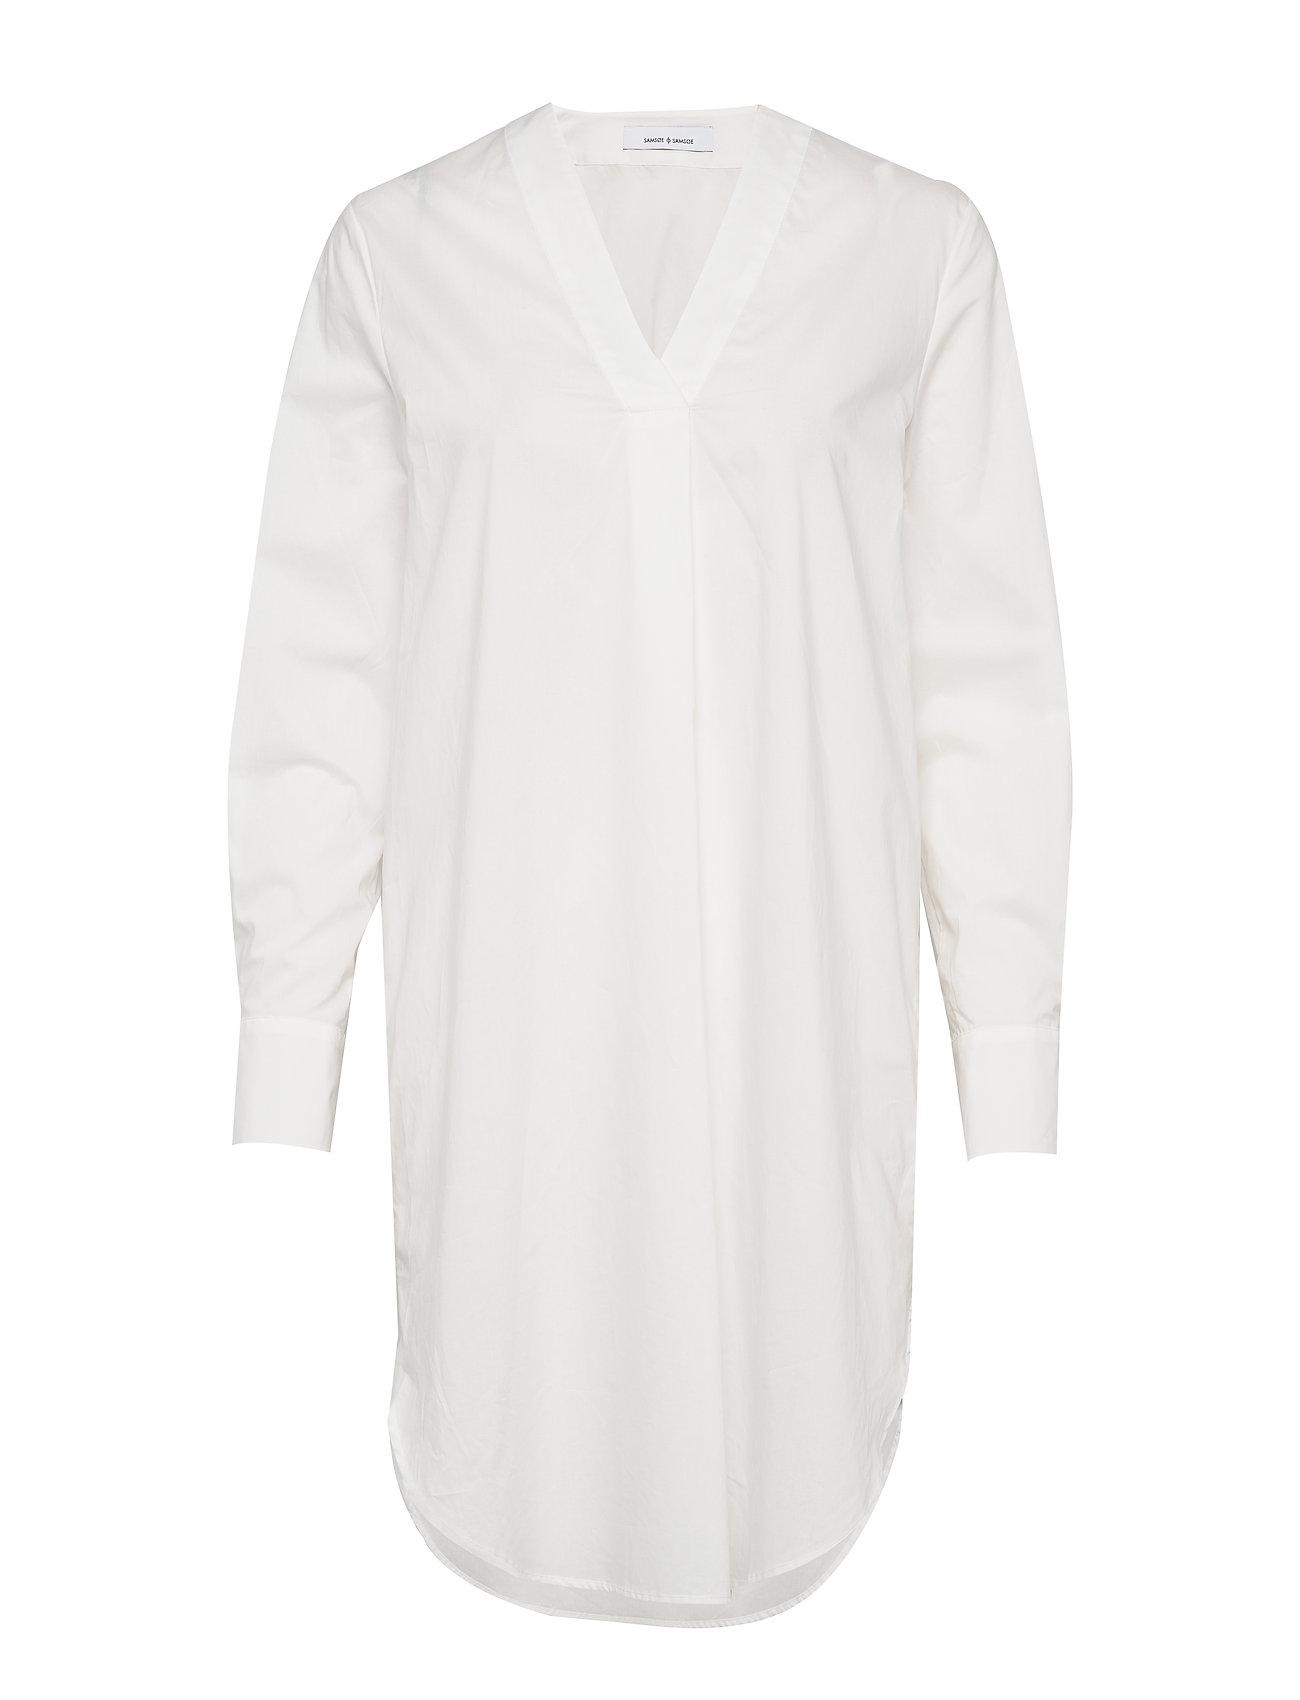 Samsøe & Samsøe Hamilla vn dress 10451 - CLEAR CREAM